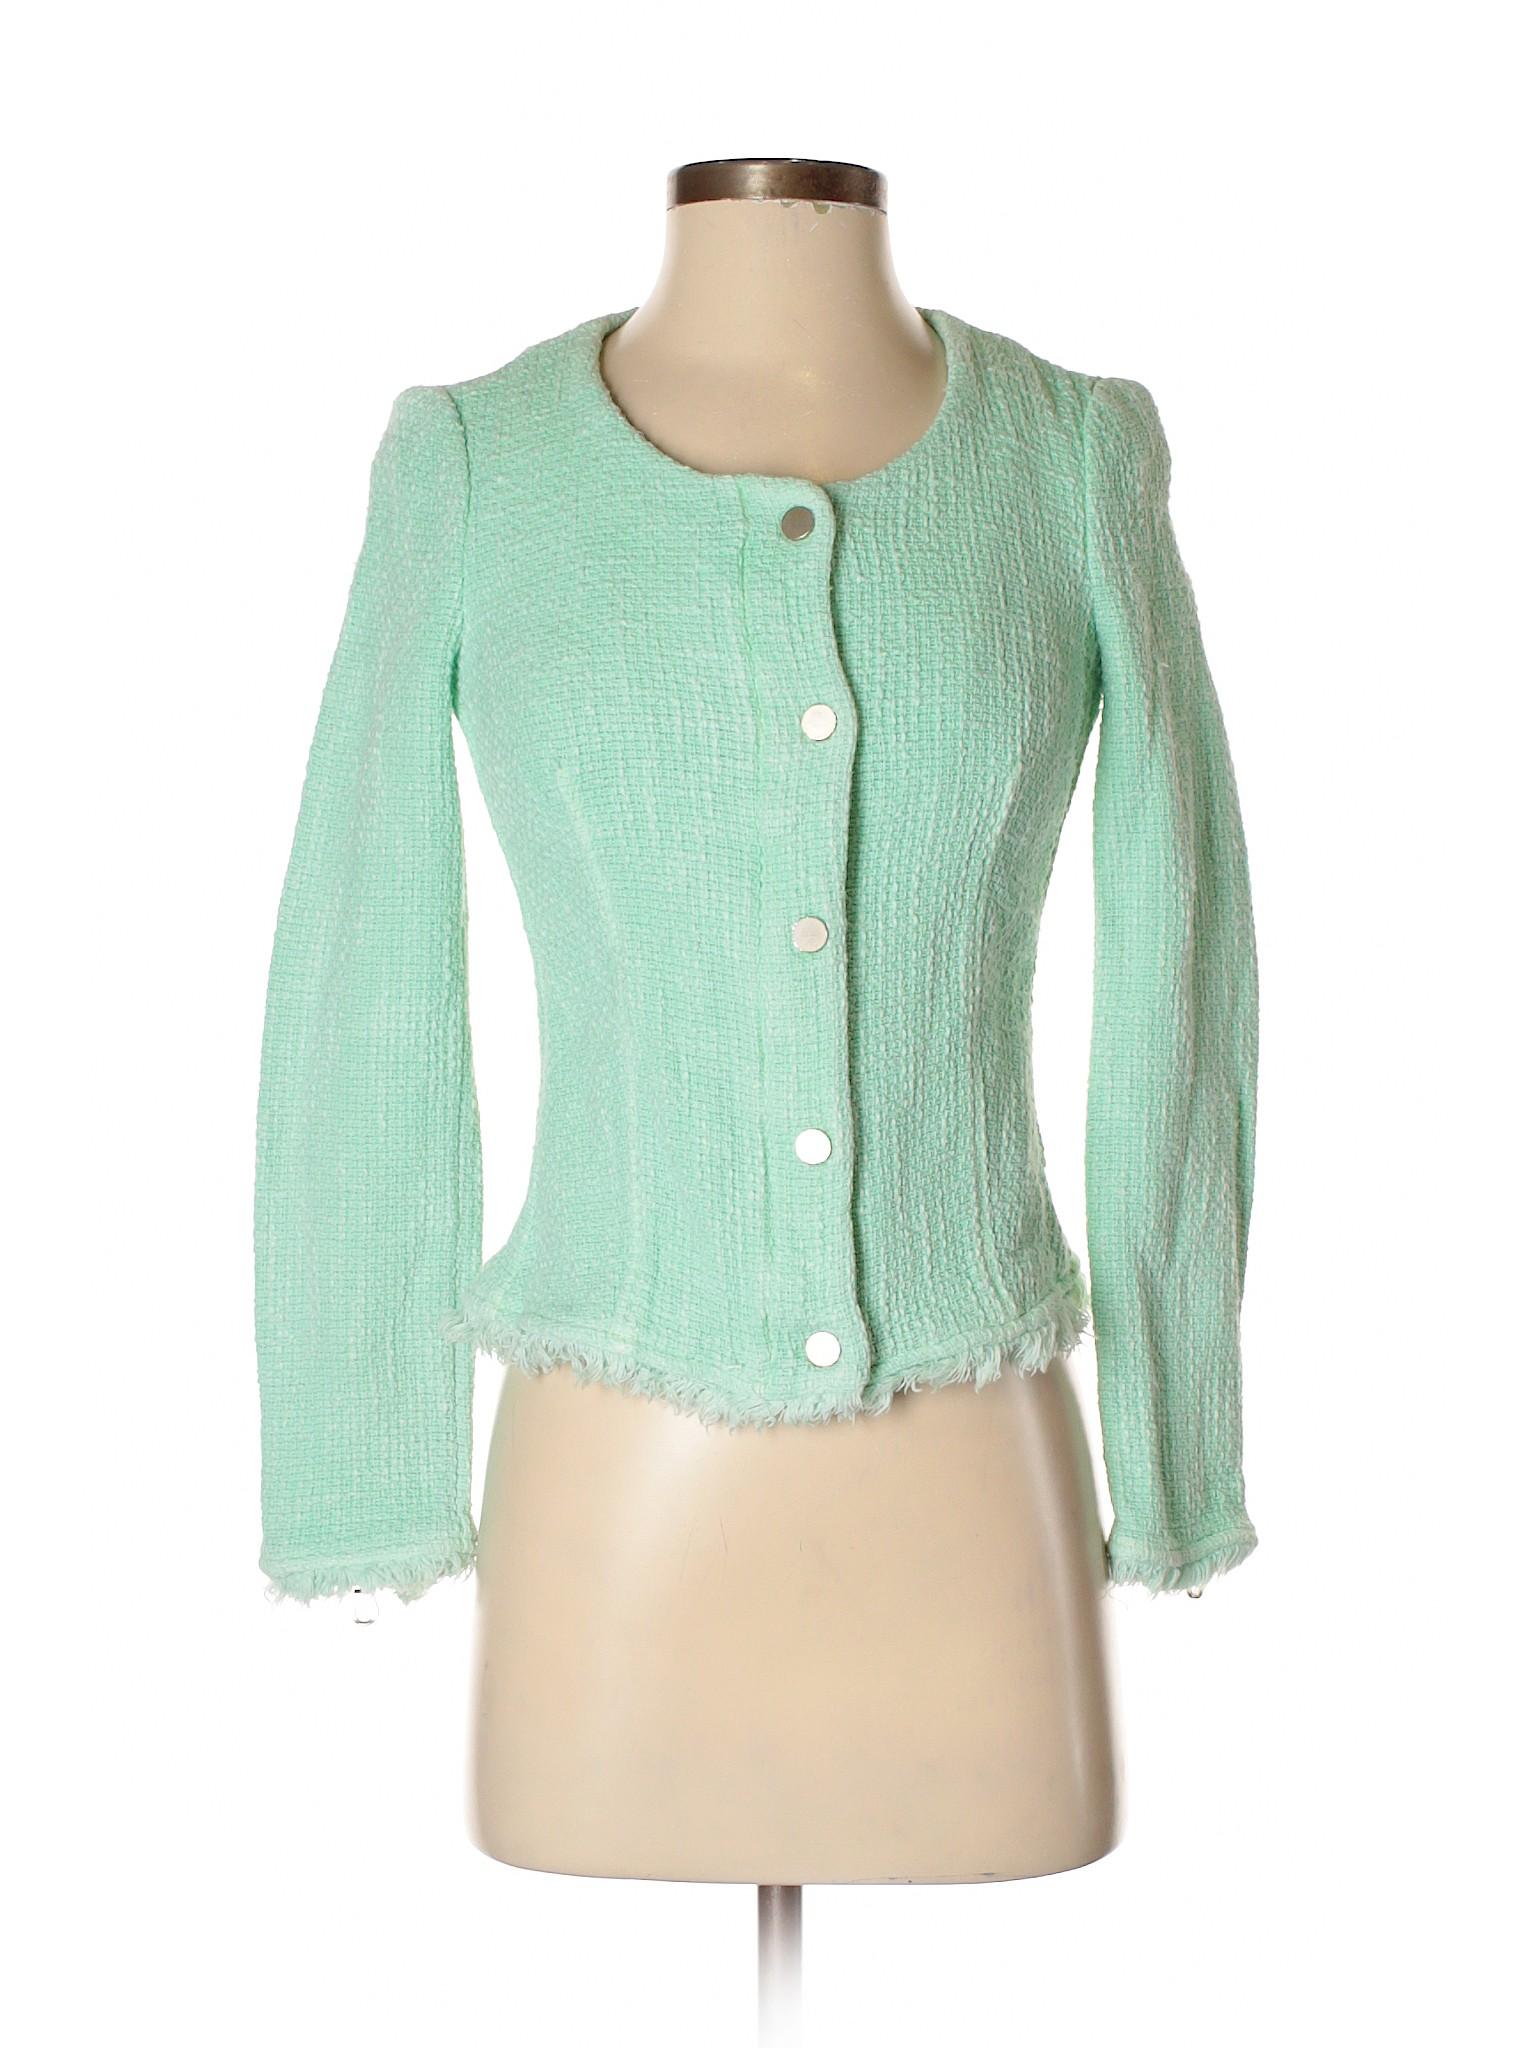 leisure Jacket Trafaluc by Zara Boutique p6BwxZZn